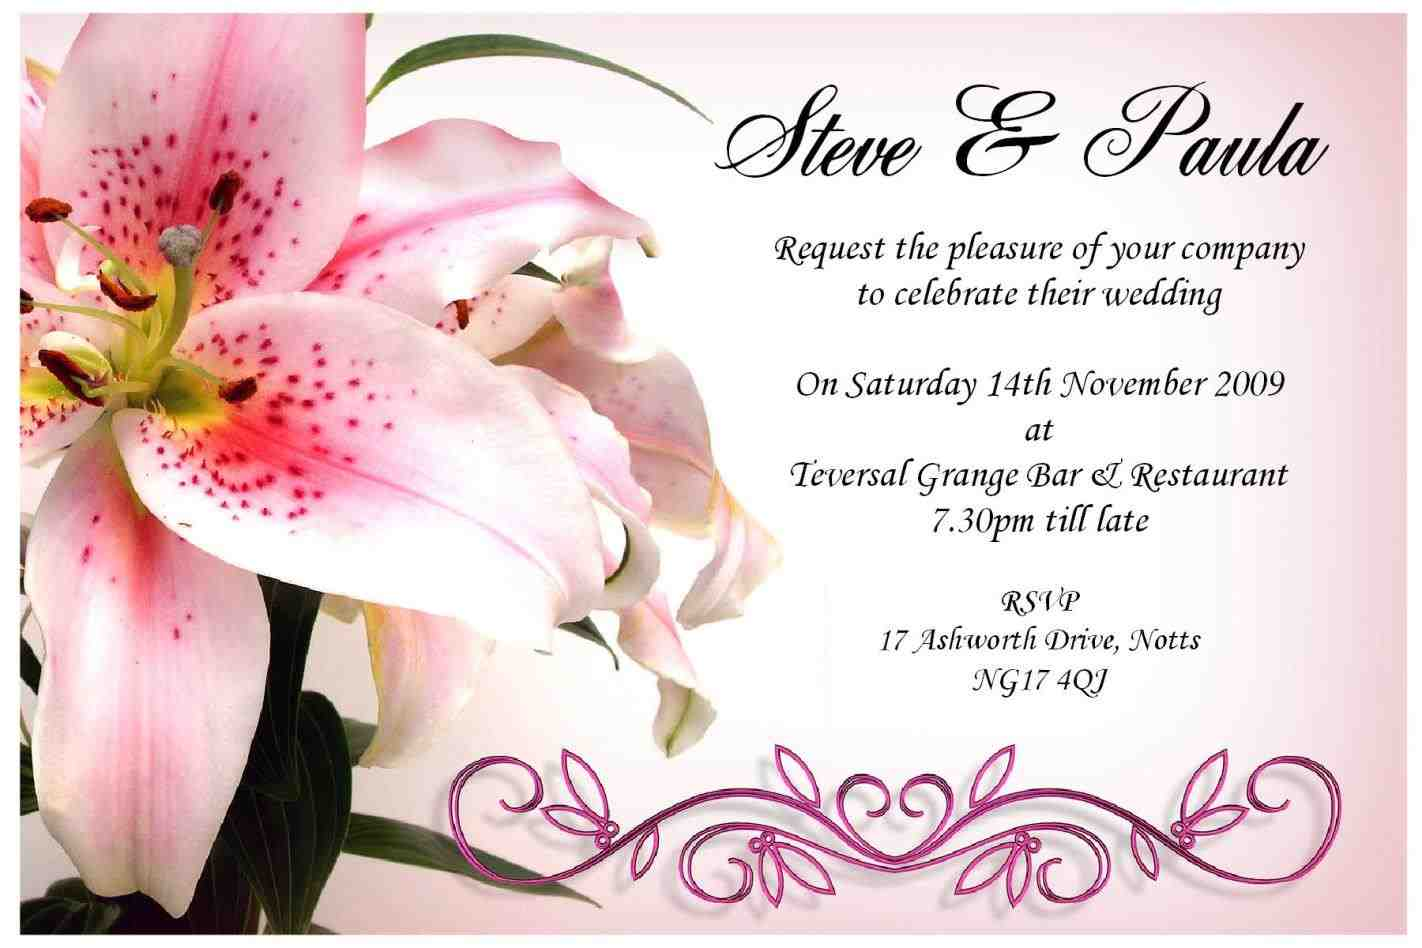 Funeral messages for flowers fabtemplatez funeral messages for flowers izmirmasajfo